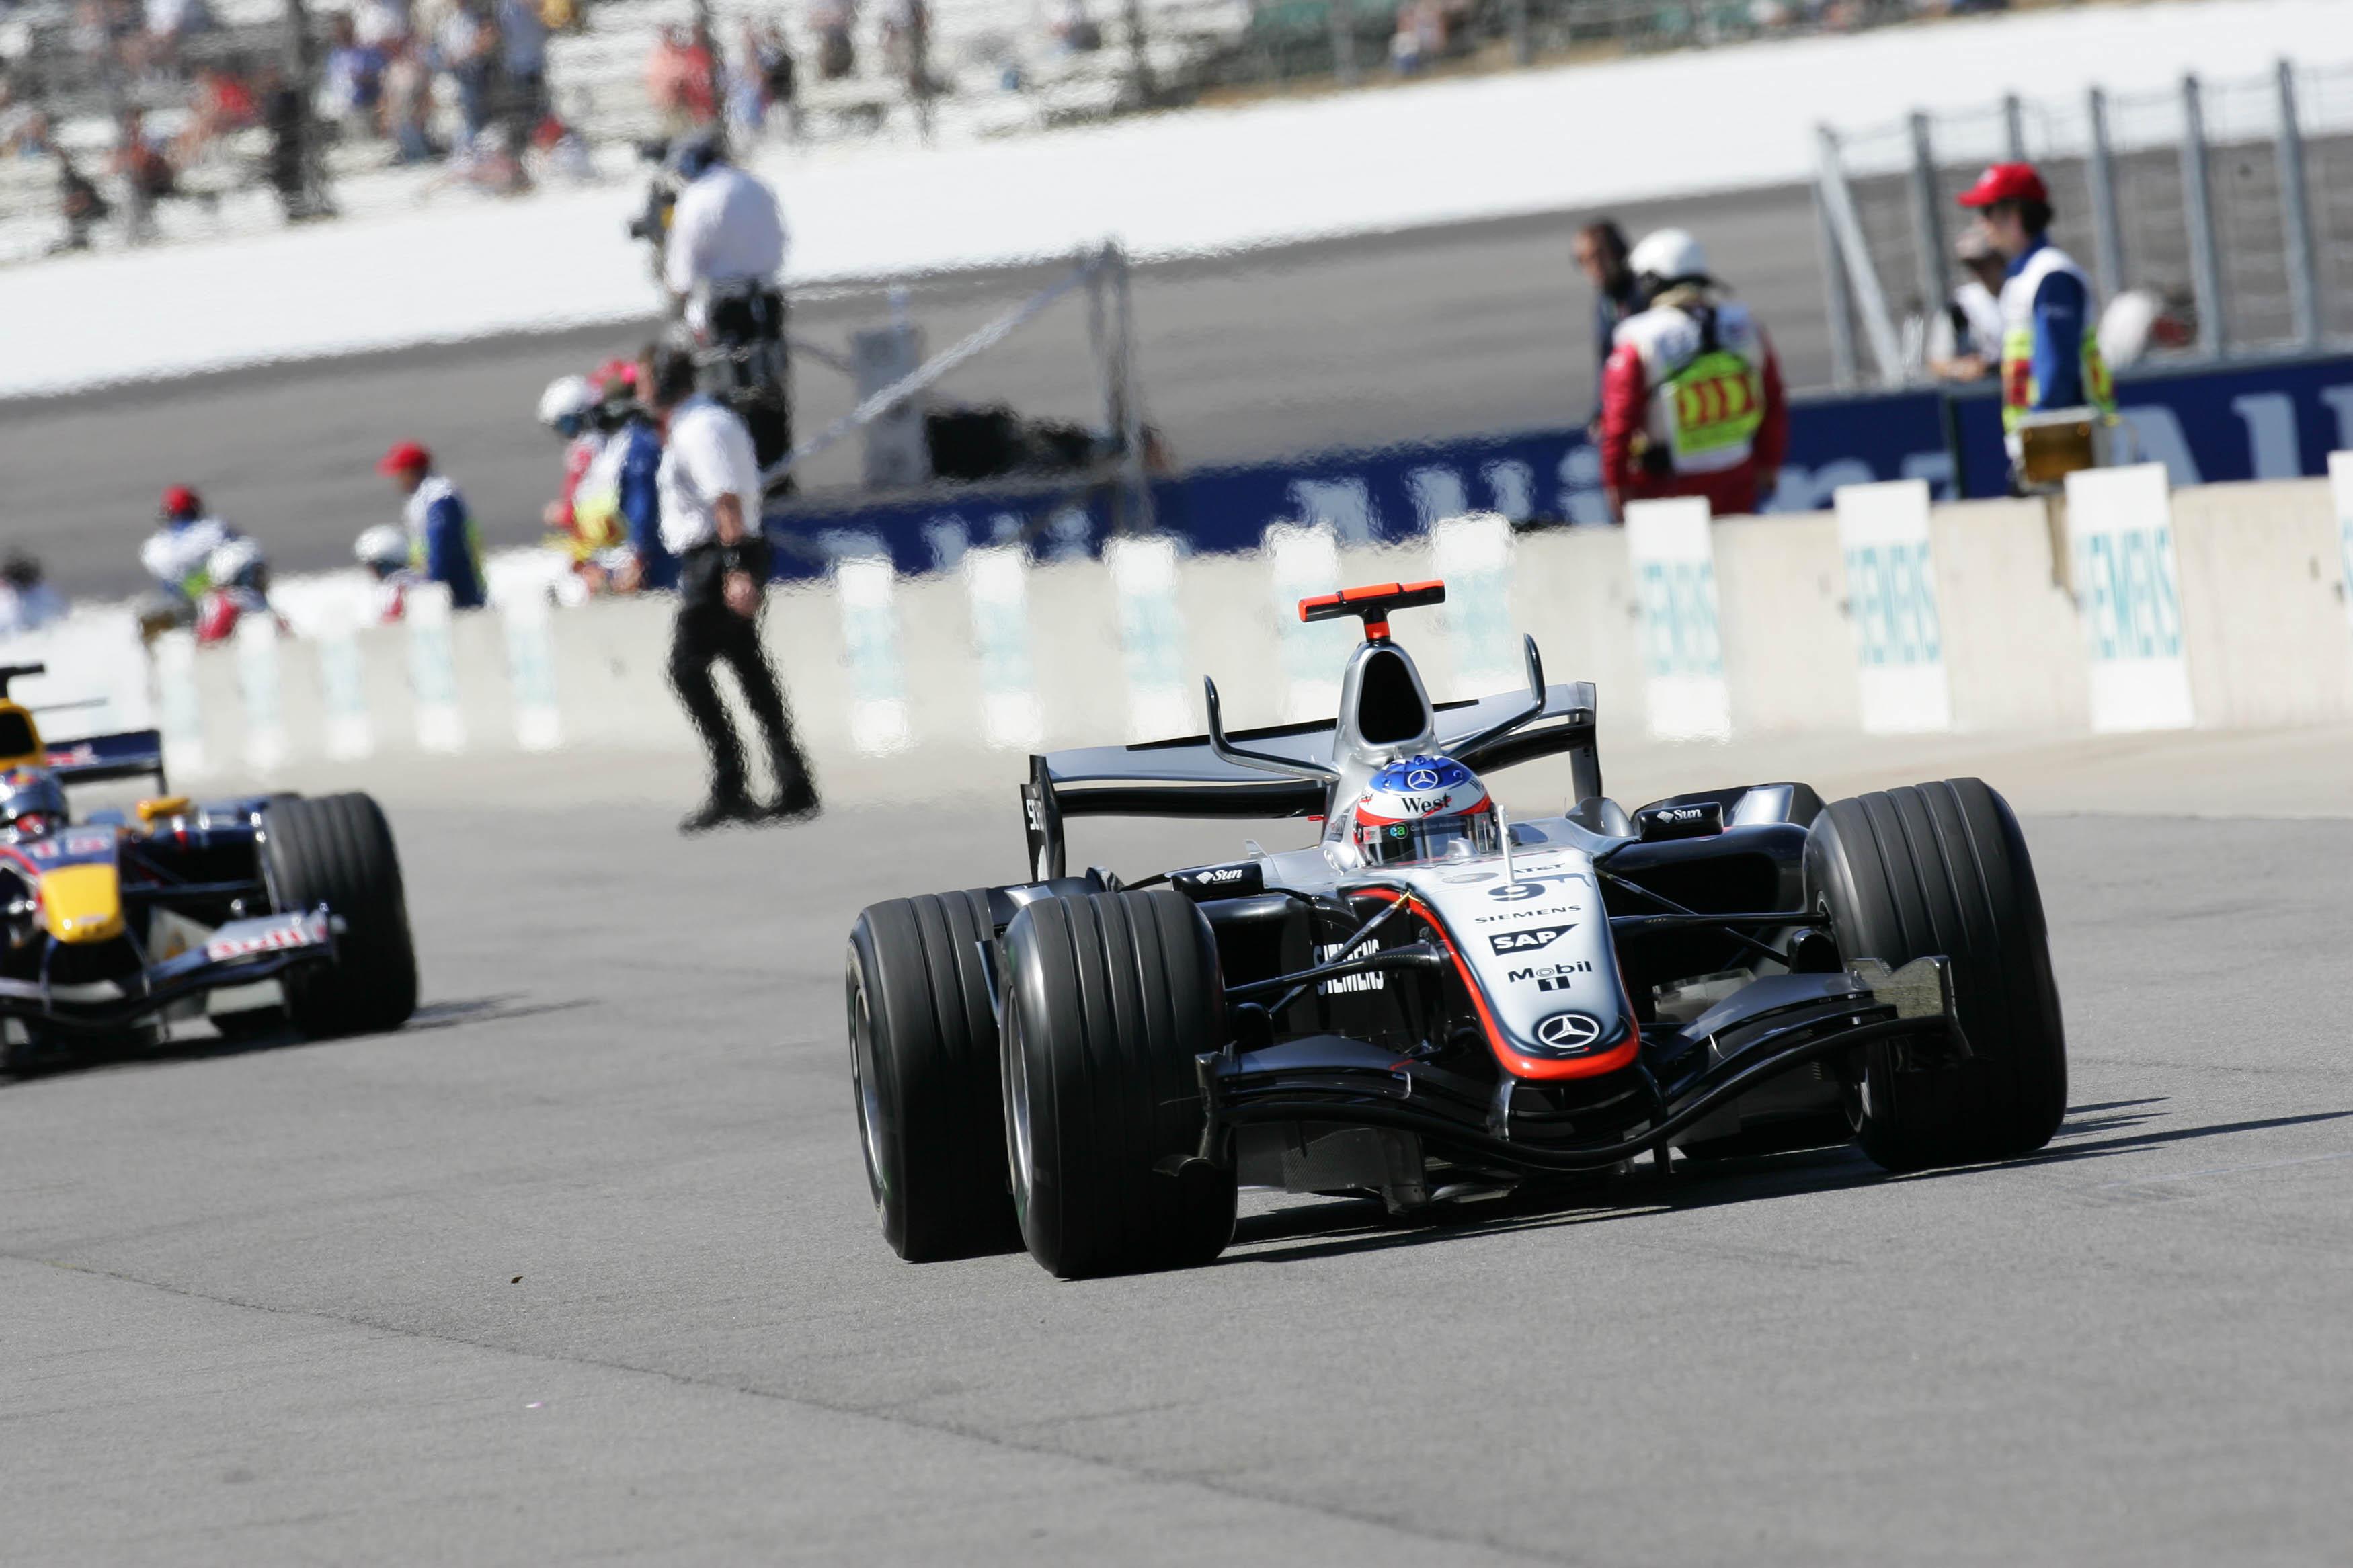 Formula 1 Grand Prix, Indianaoplis, Practice